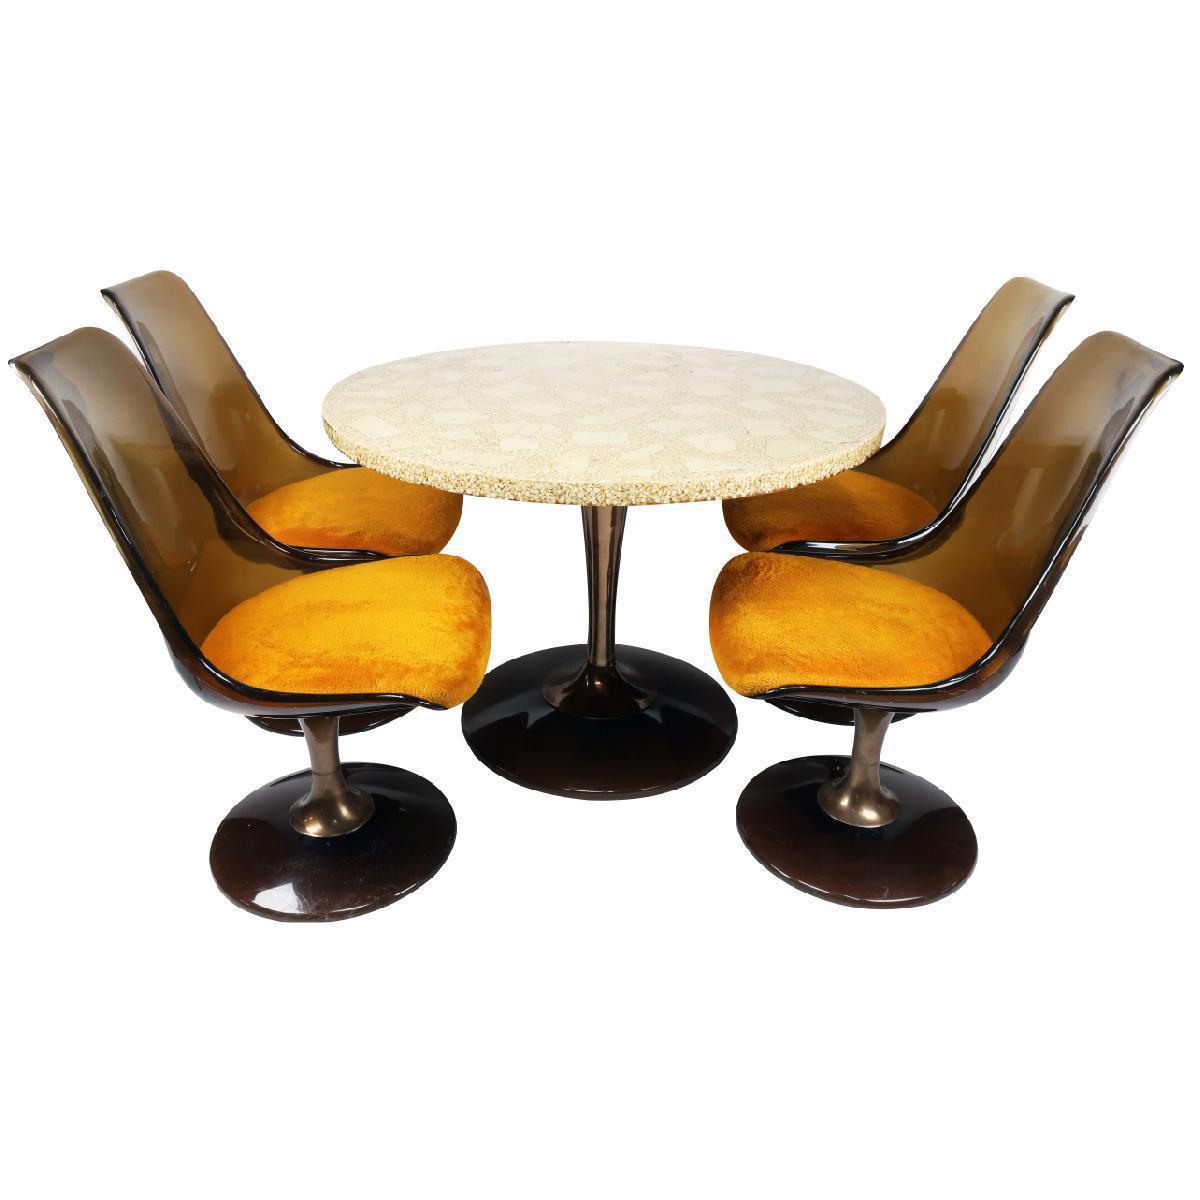 Chromcraft Amber Lucite Tulip Table \u0026 Chairs - Set of 5  sc 1 st  Chairish & Chromcraft Amber Lucite Tulip Table \u0026 Chairs - Set of 5   Chairish